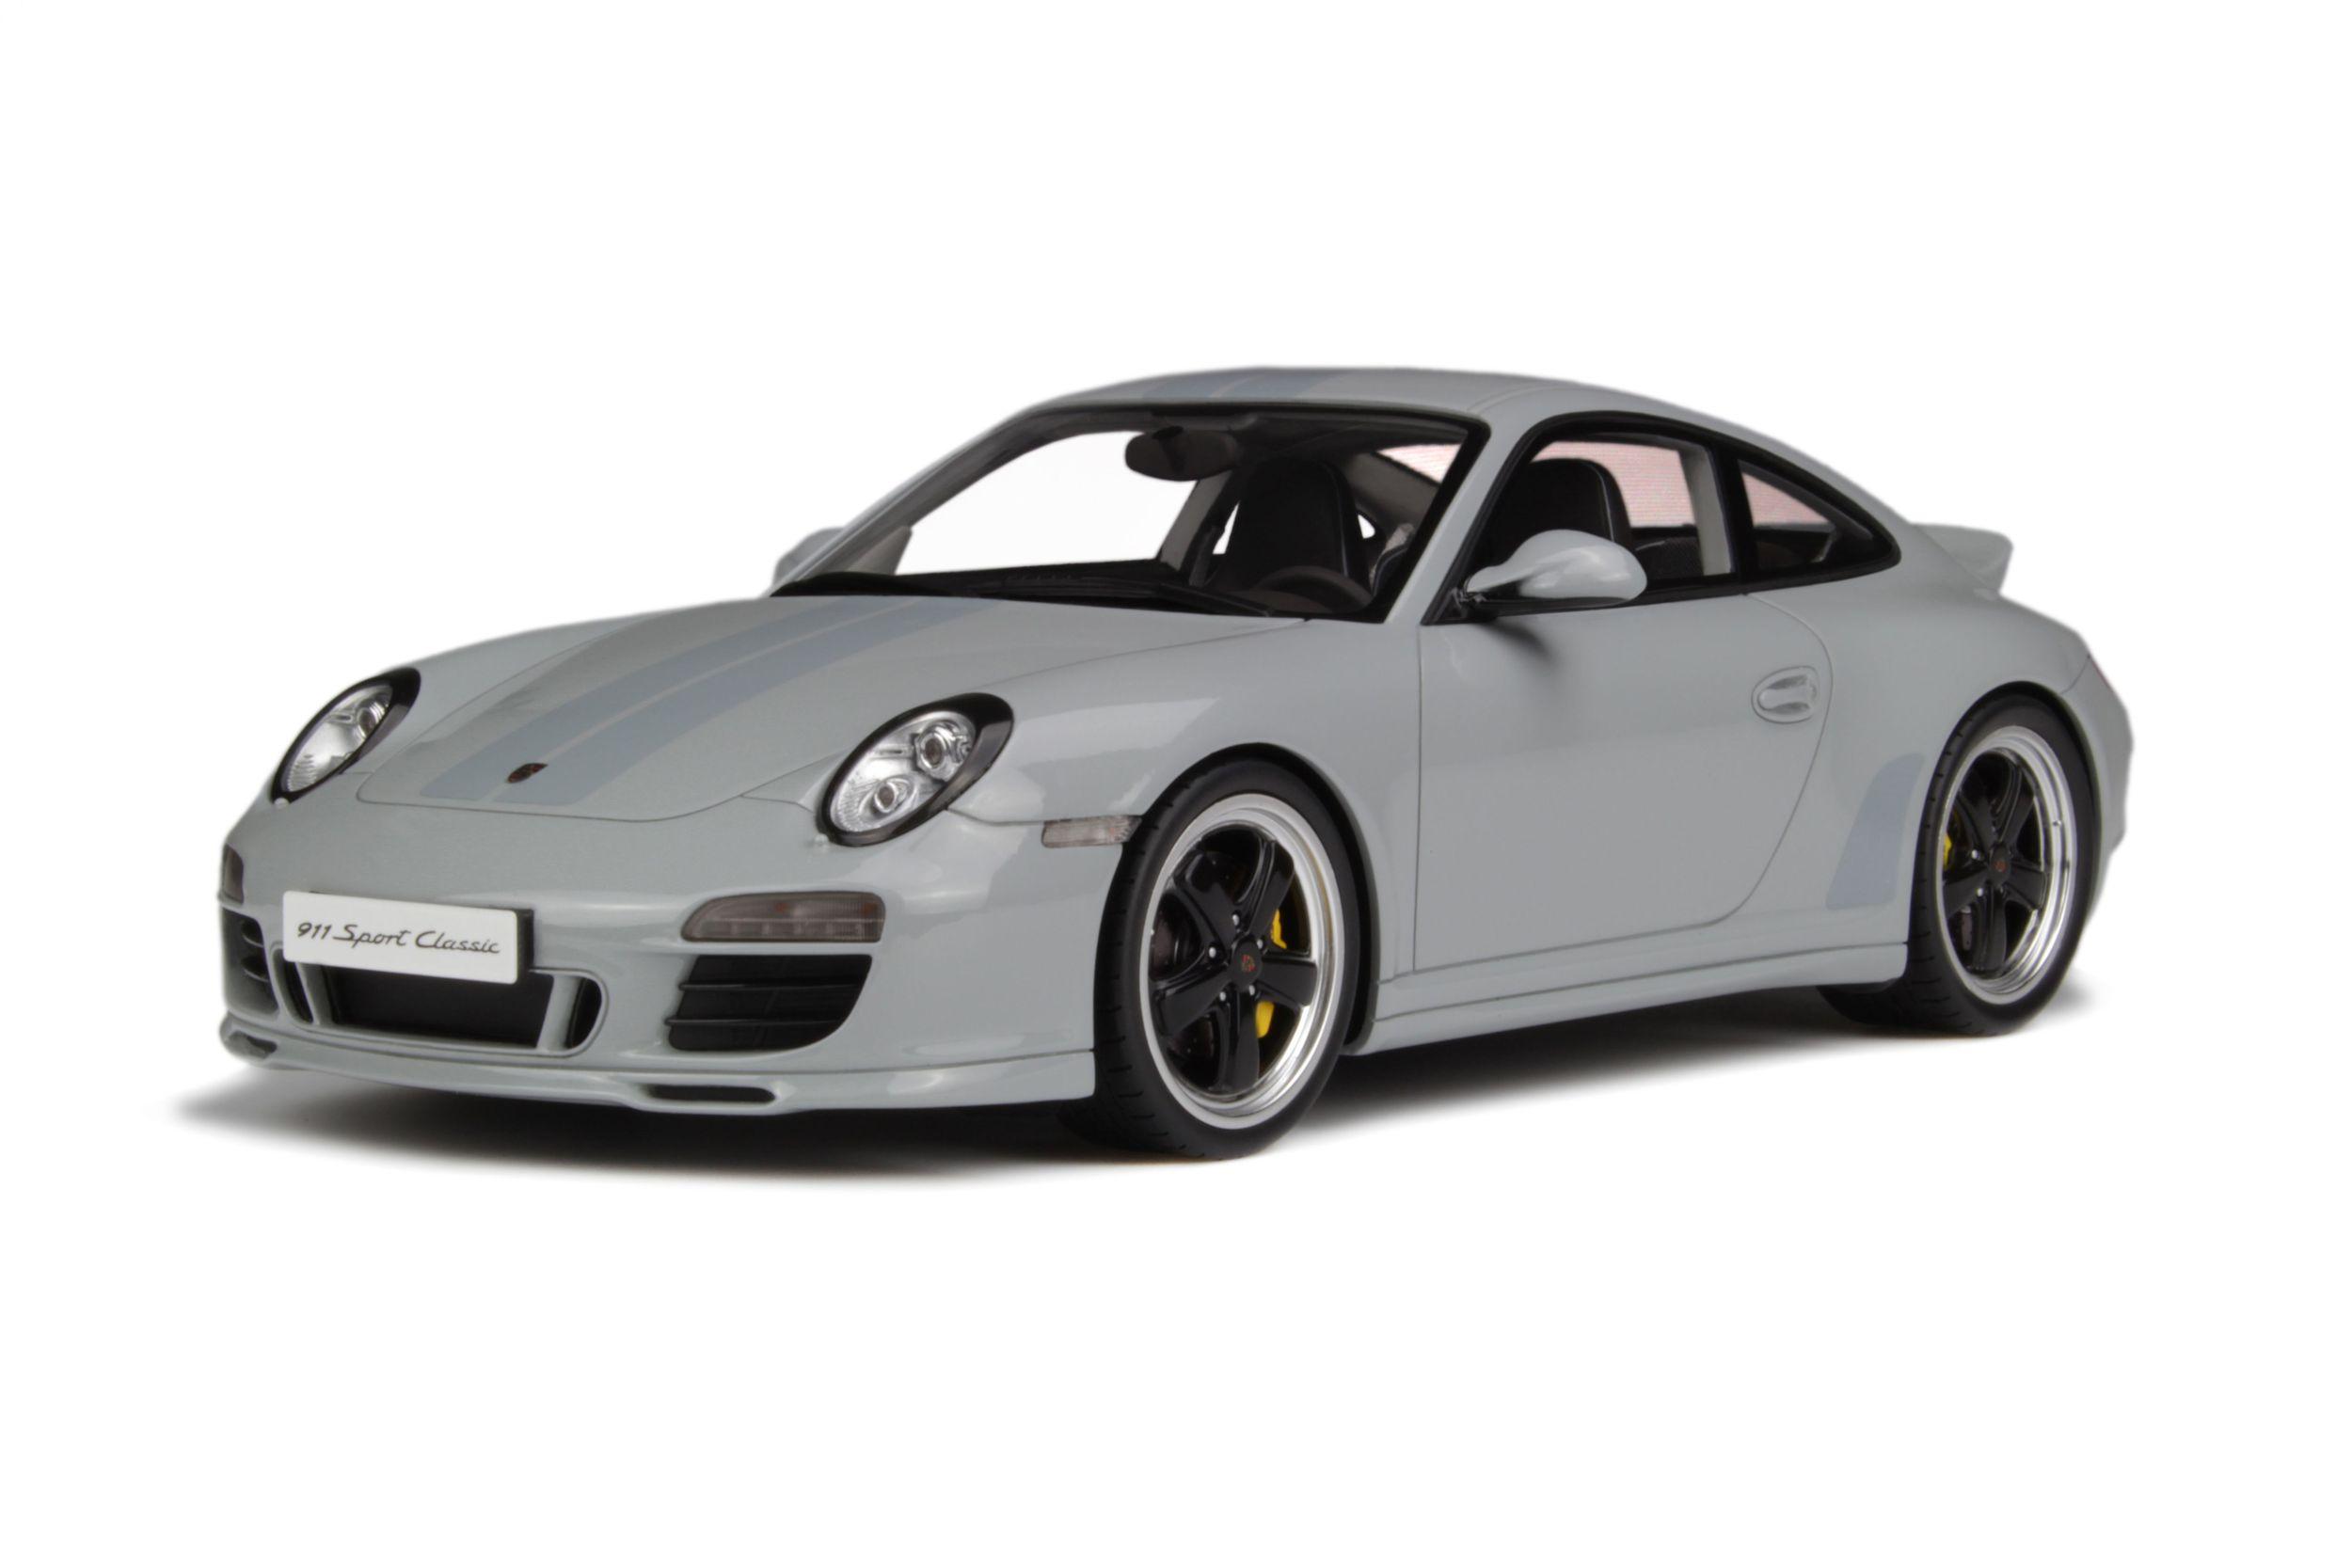 porsche 911 997 sport classic model car collection. Black Bedroom Furniture Sets. Home Design Ideas